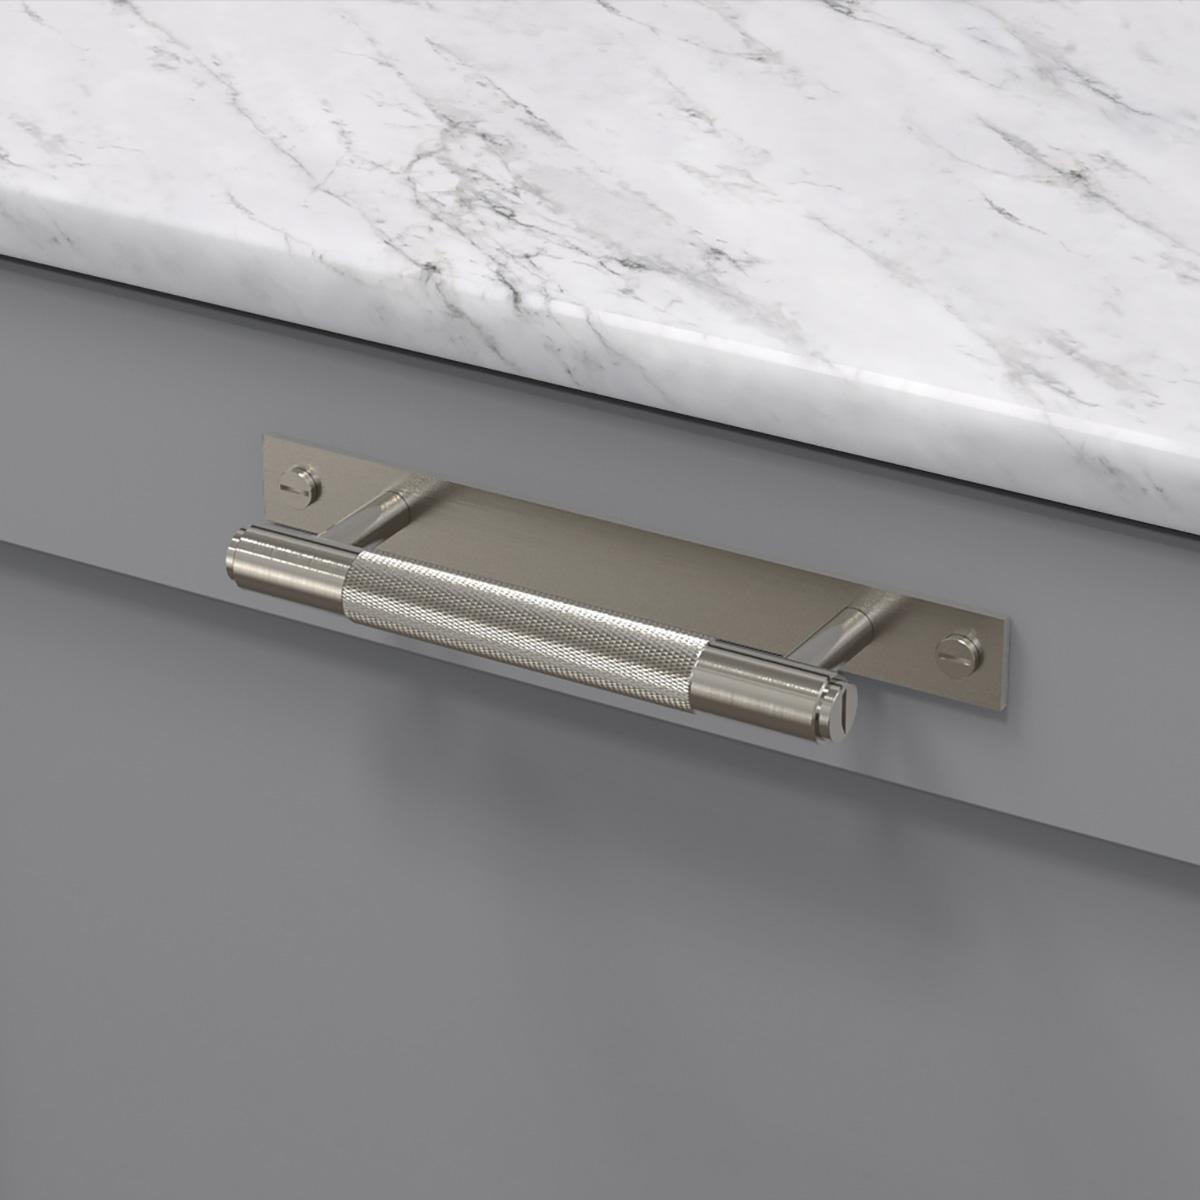 pull bar plate stål uk pb hp 160 st a cc 125 mm ncs s 4500 n marmor carrara